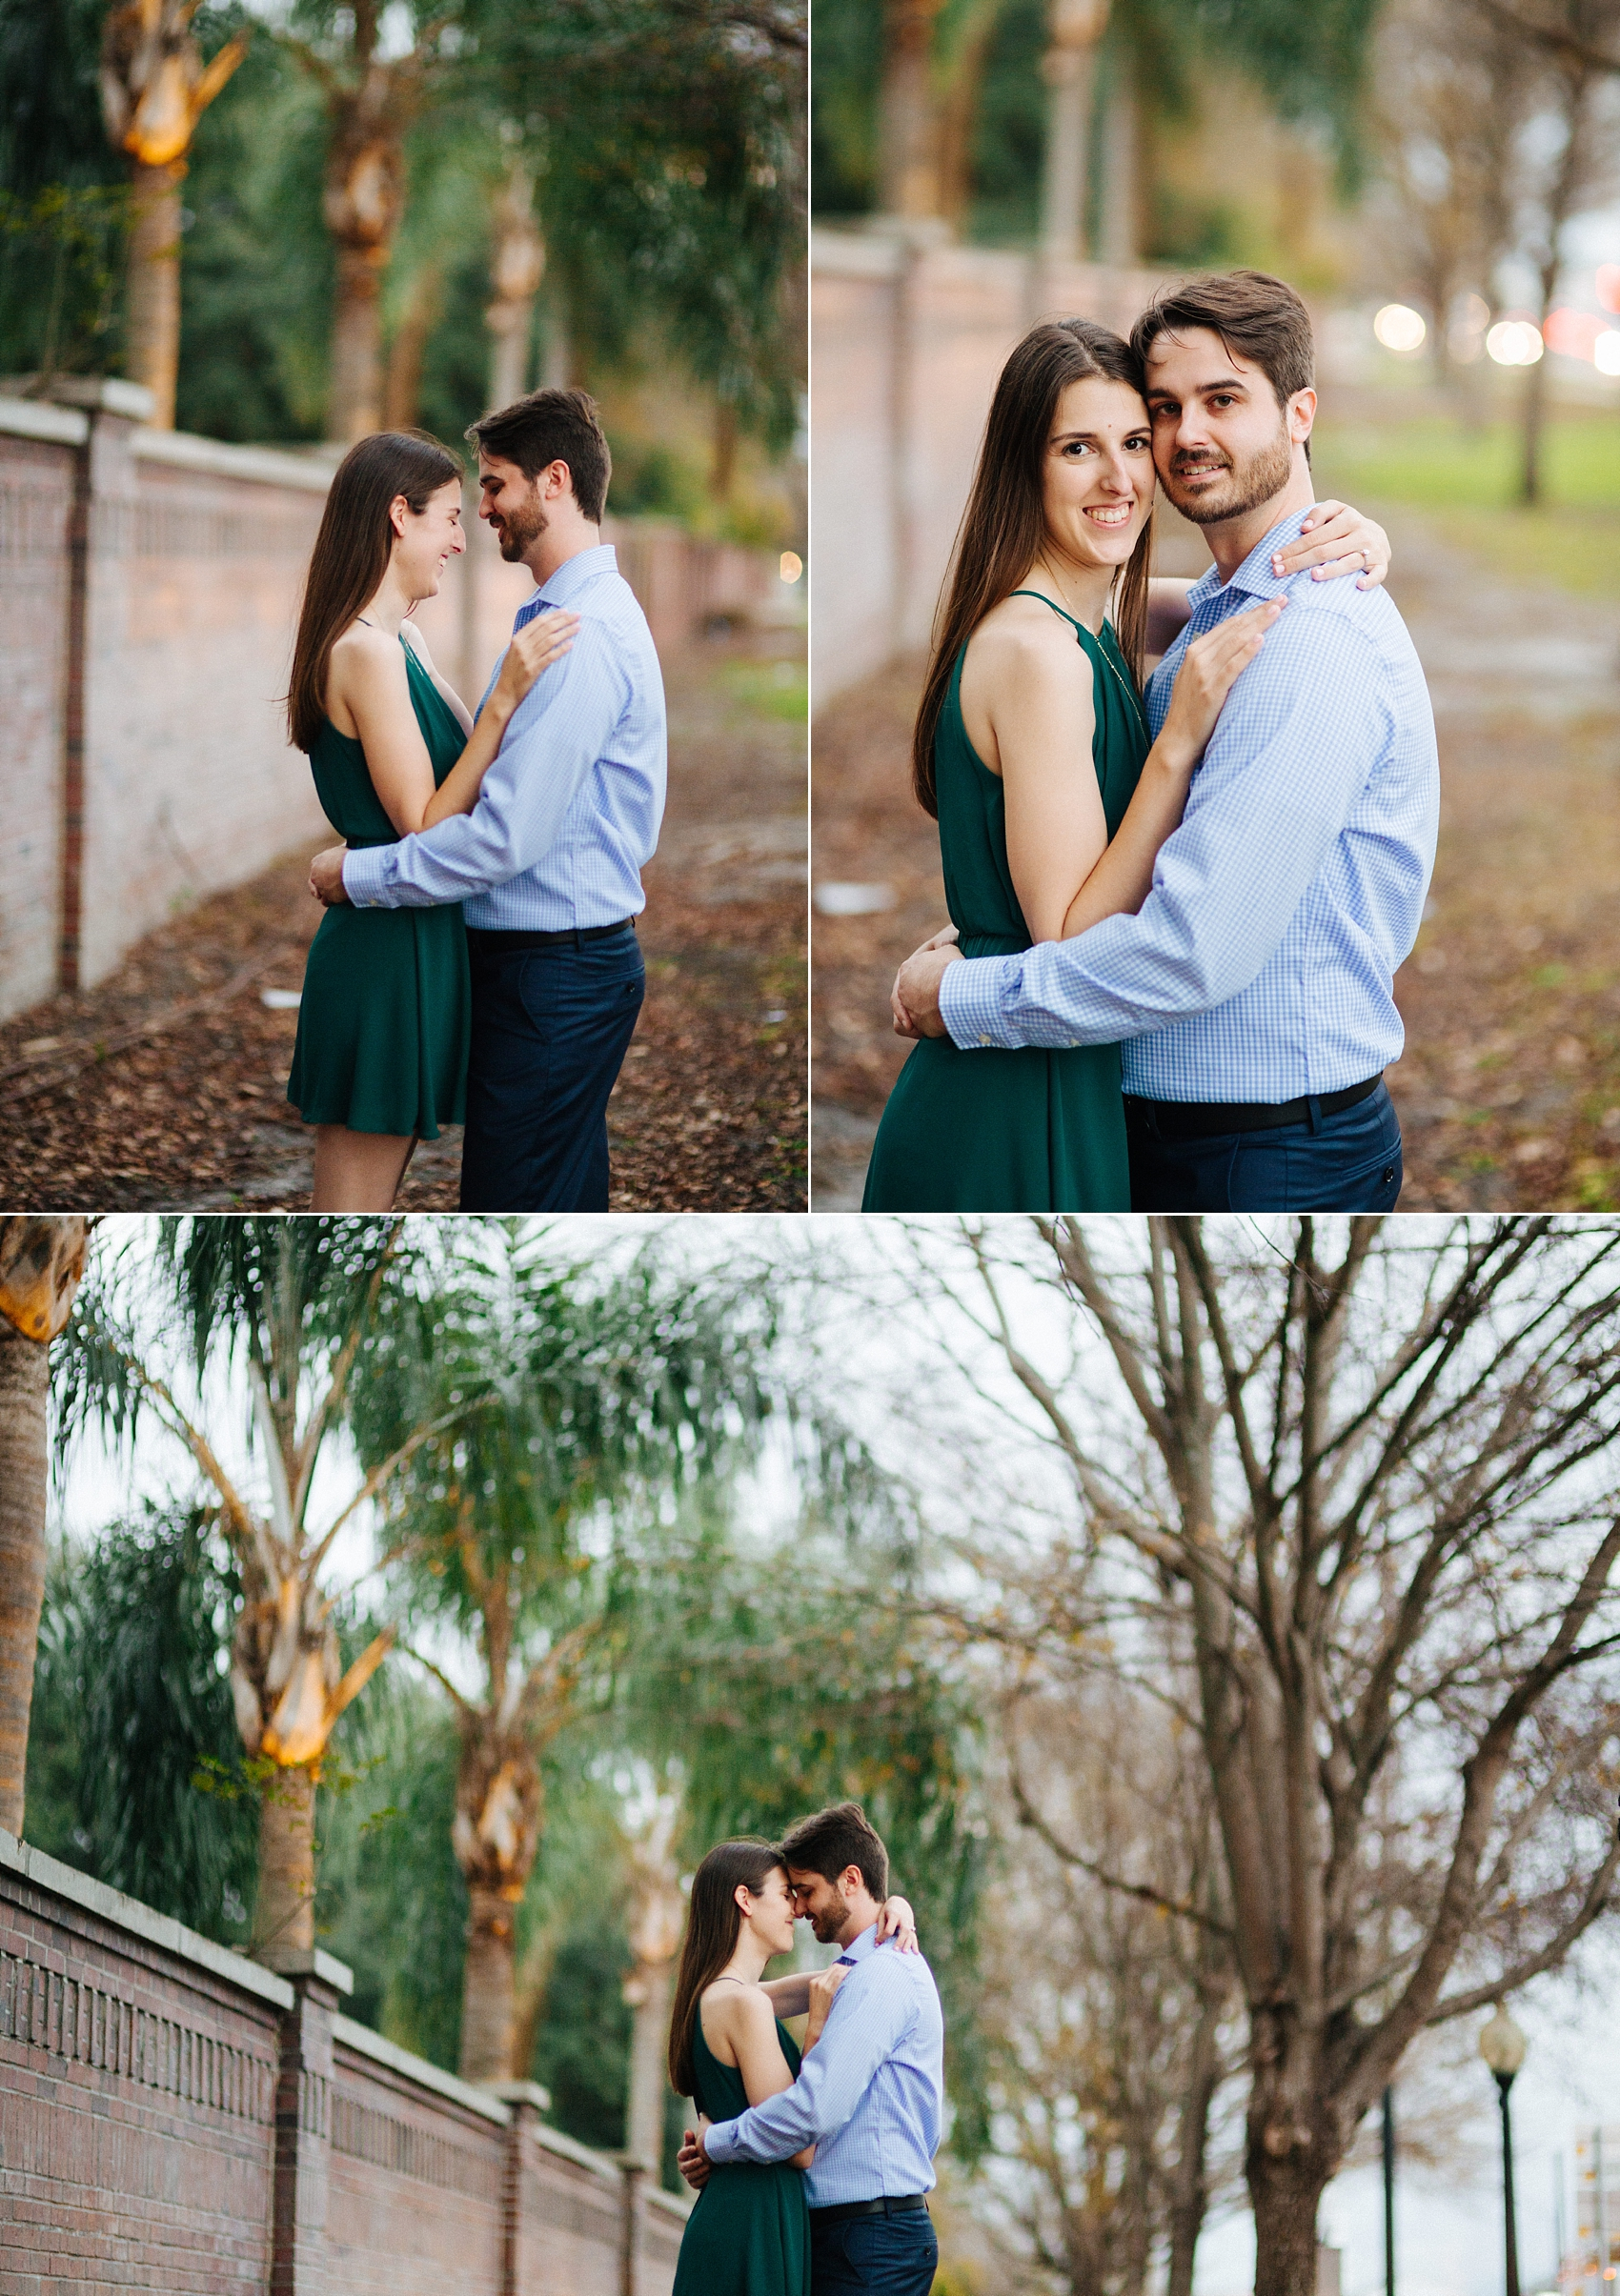 Jake & Katie Photography Seminole Heights Engagement Photos David & Cailyn-021.jpg